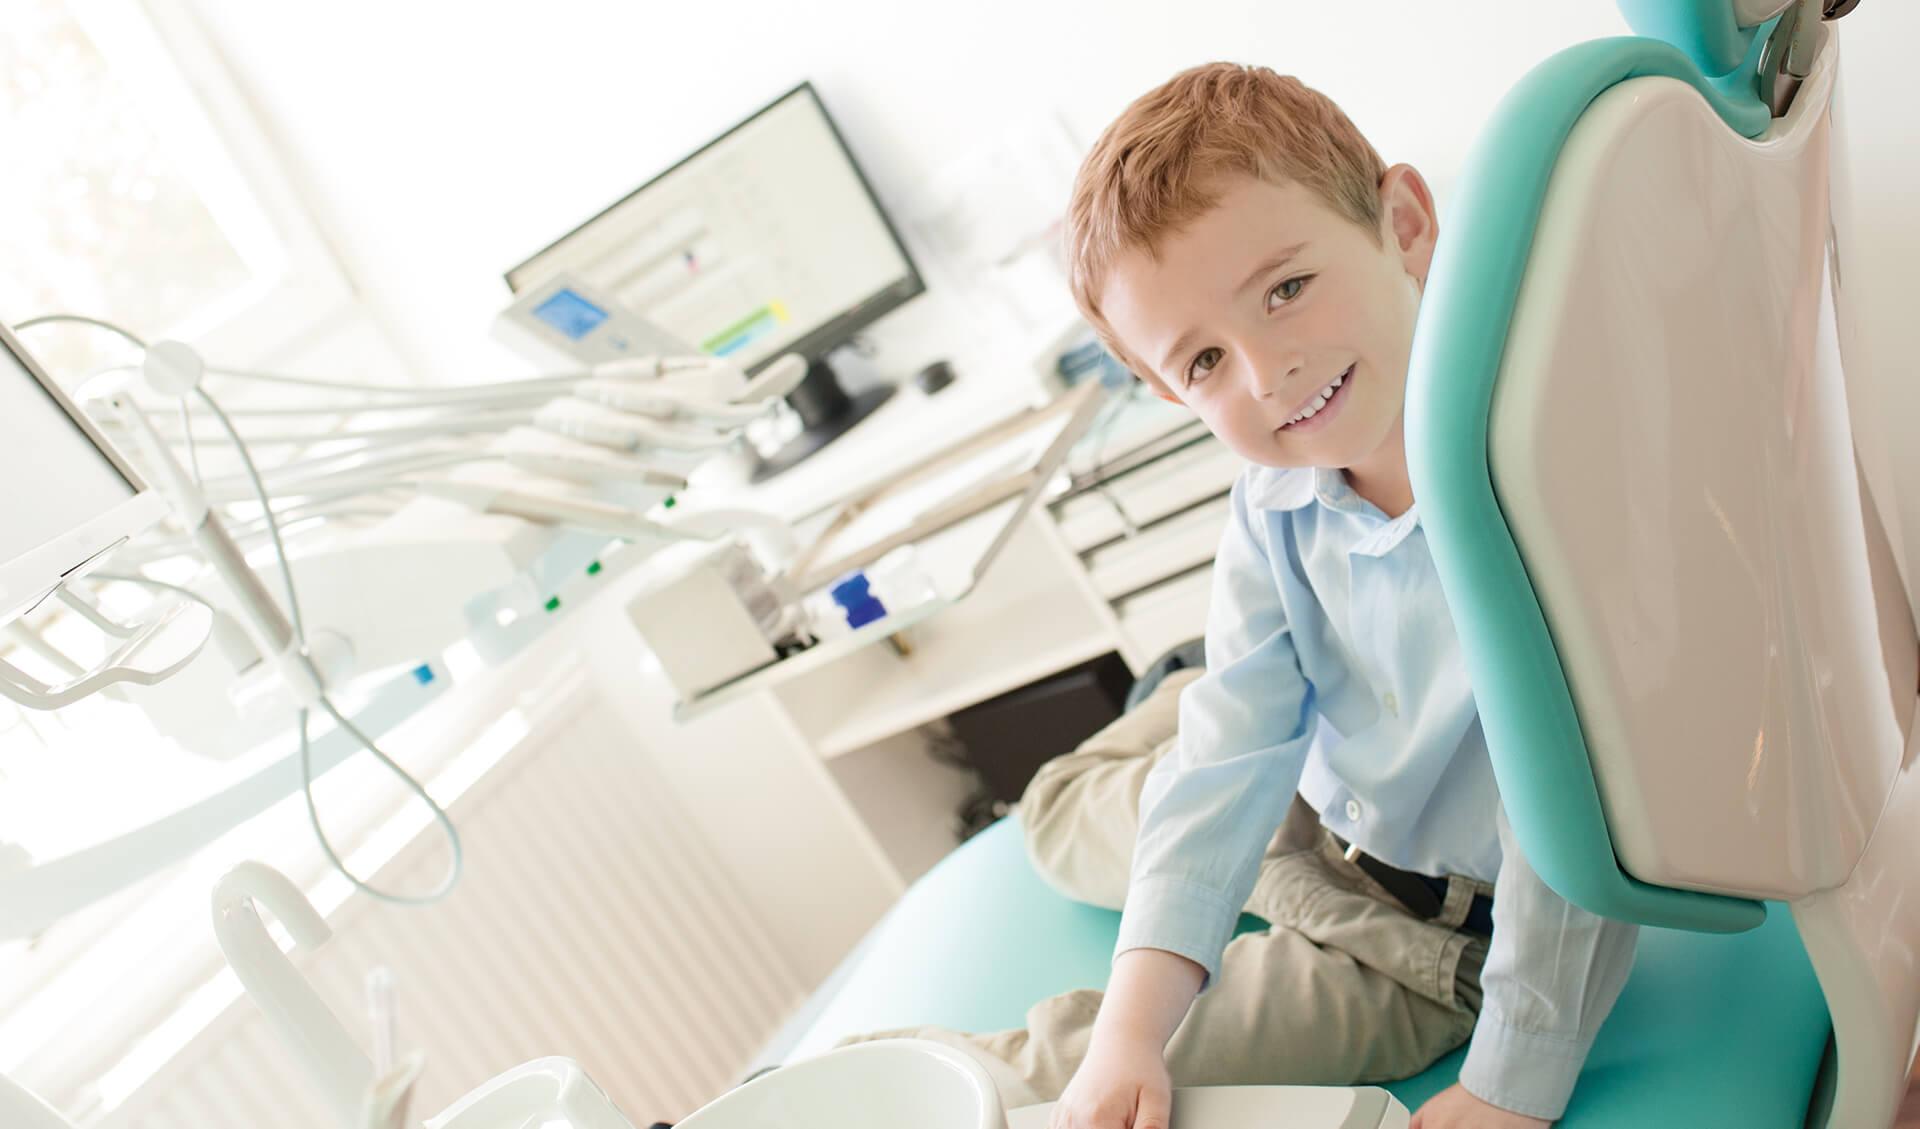 Ordination Zahnarzt 23 Benny auf Stuhl